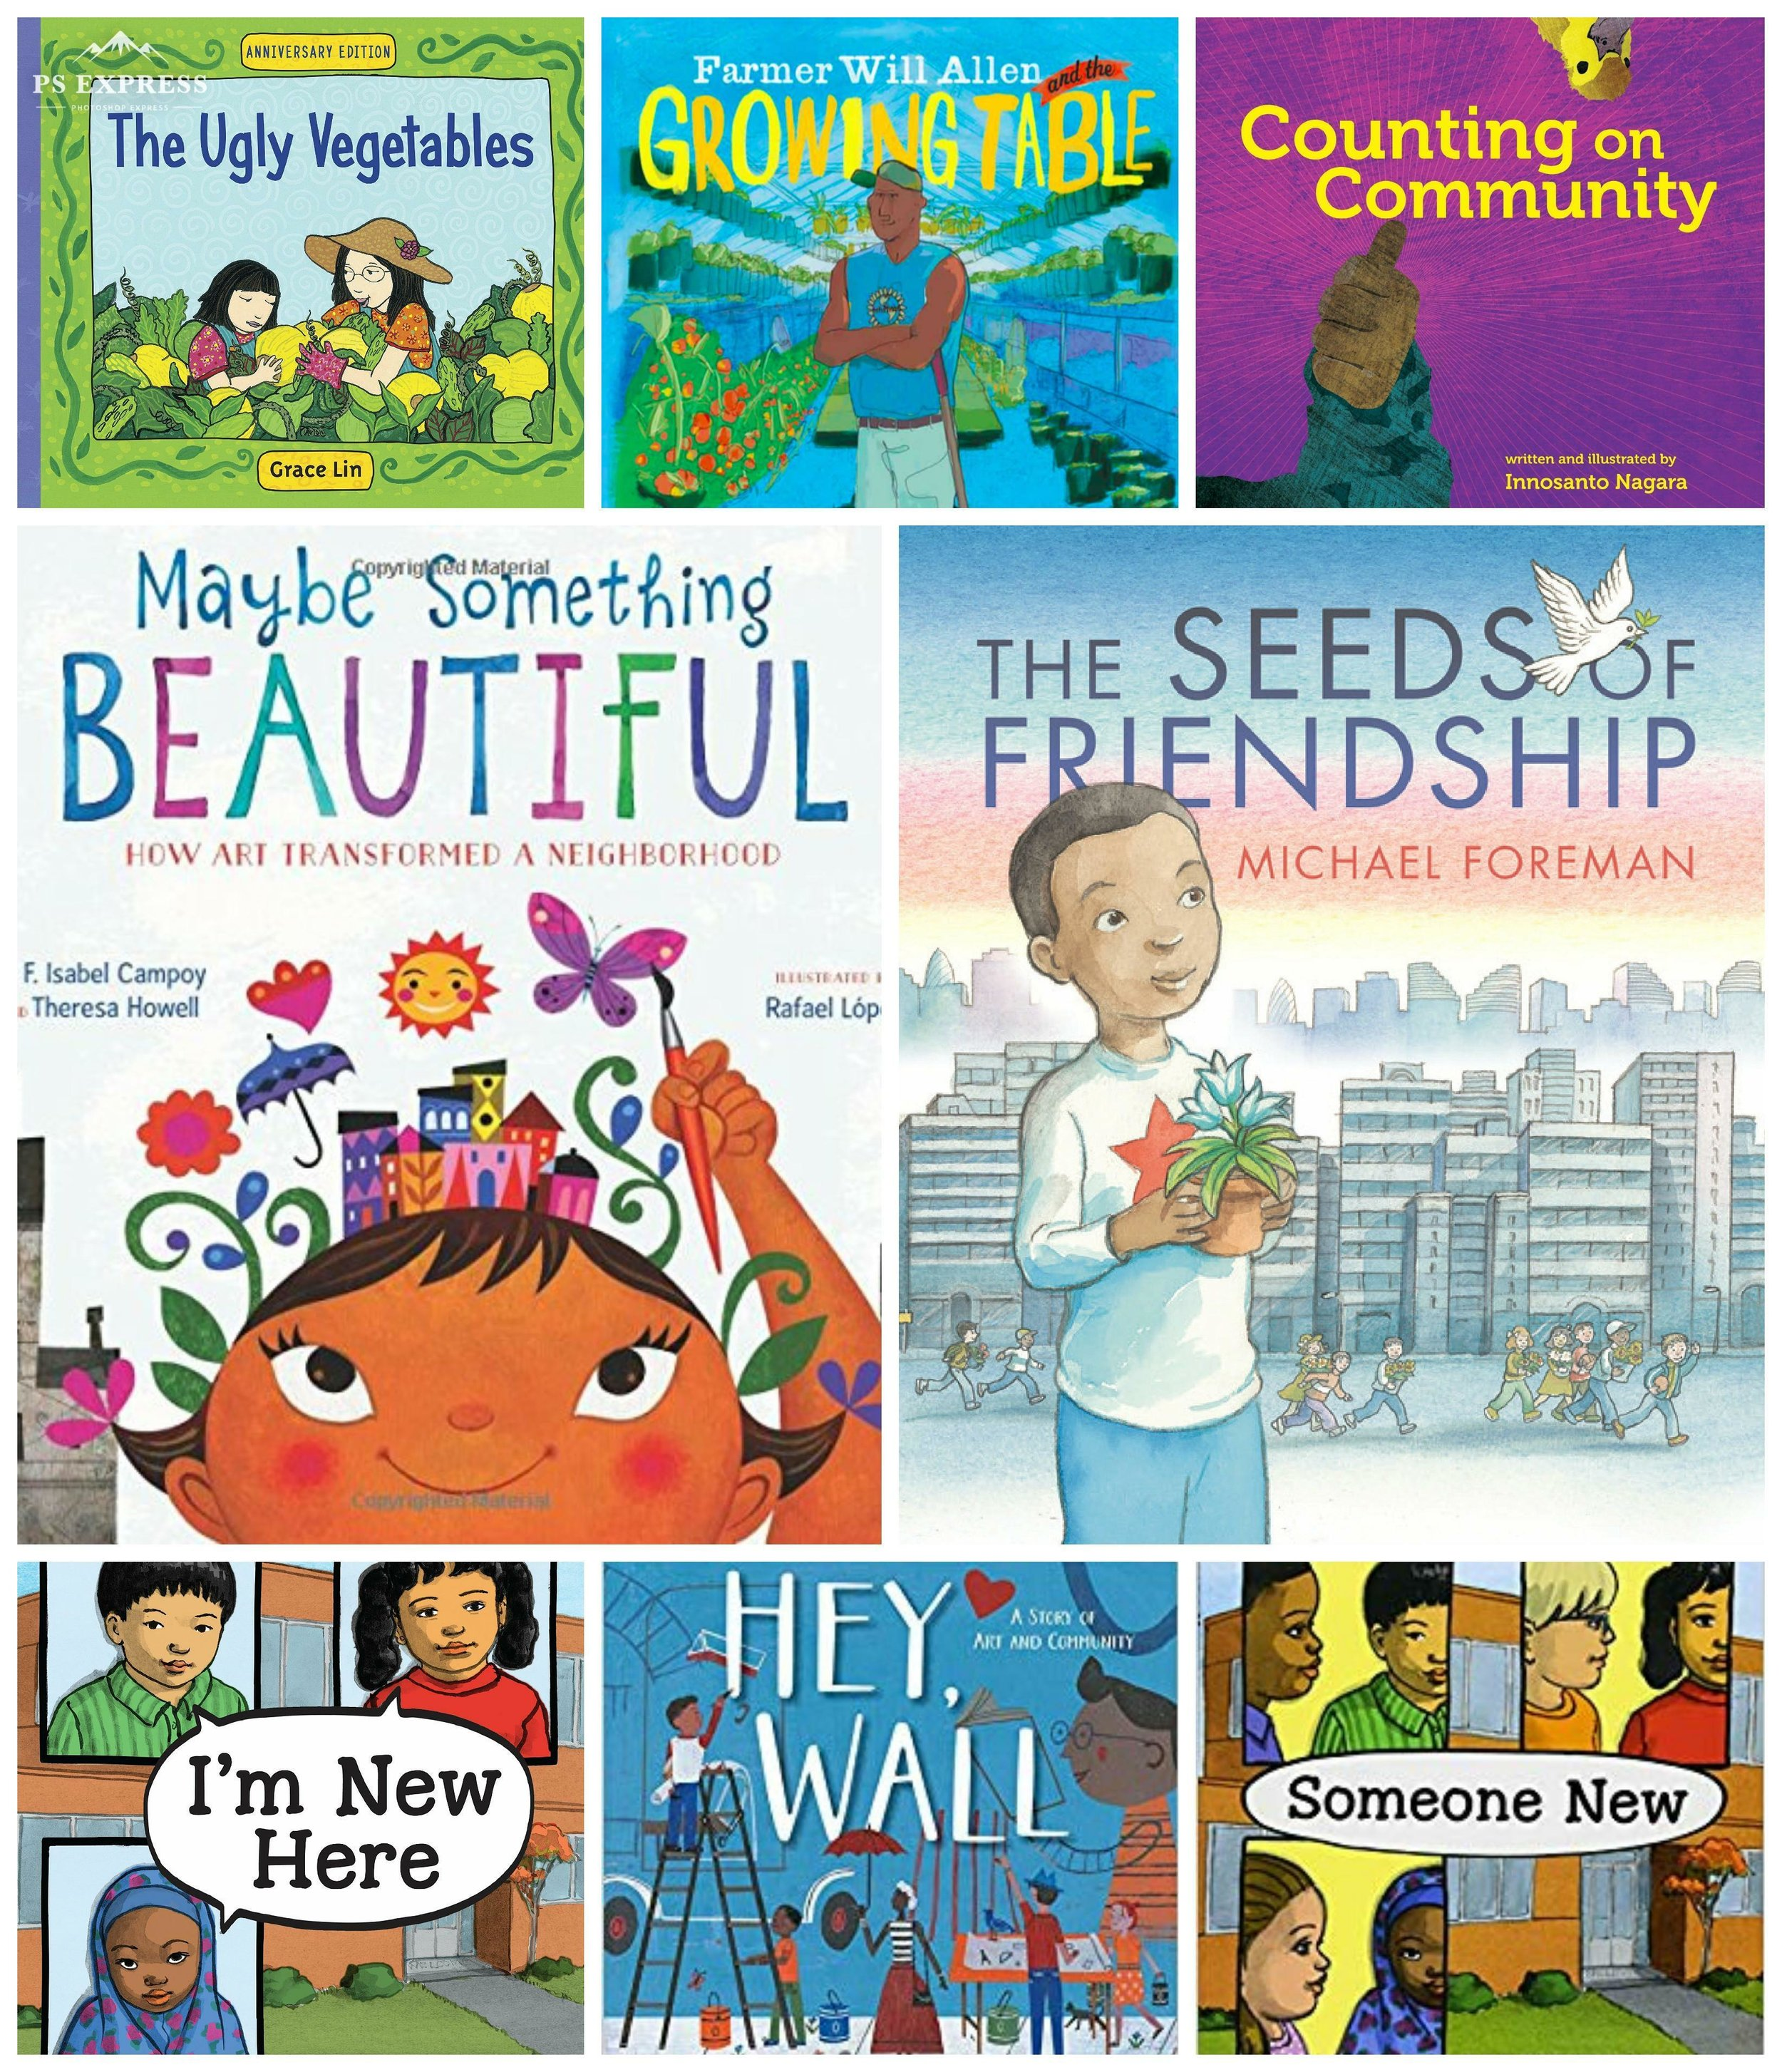 FOR THE KIDS - books celebrating community